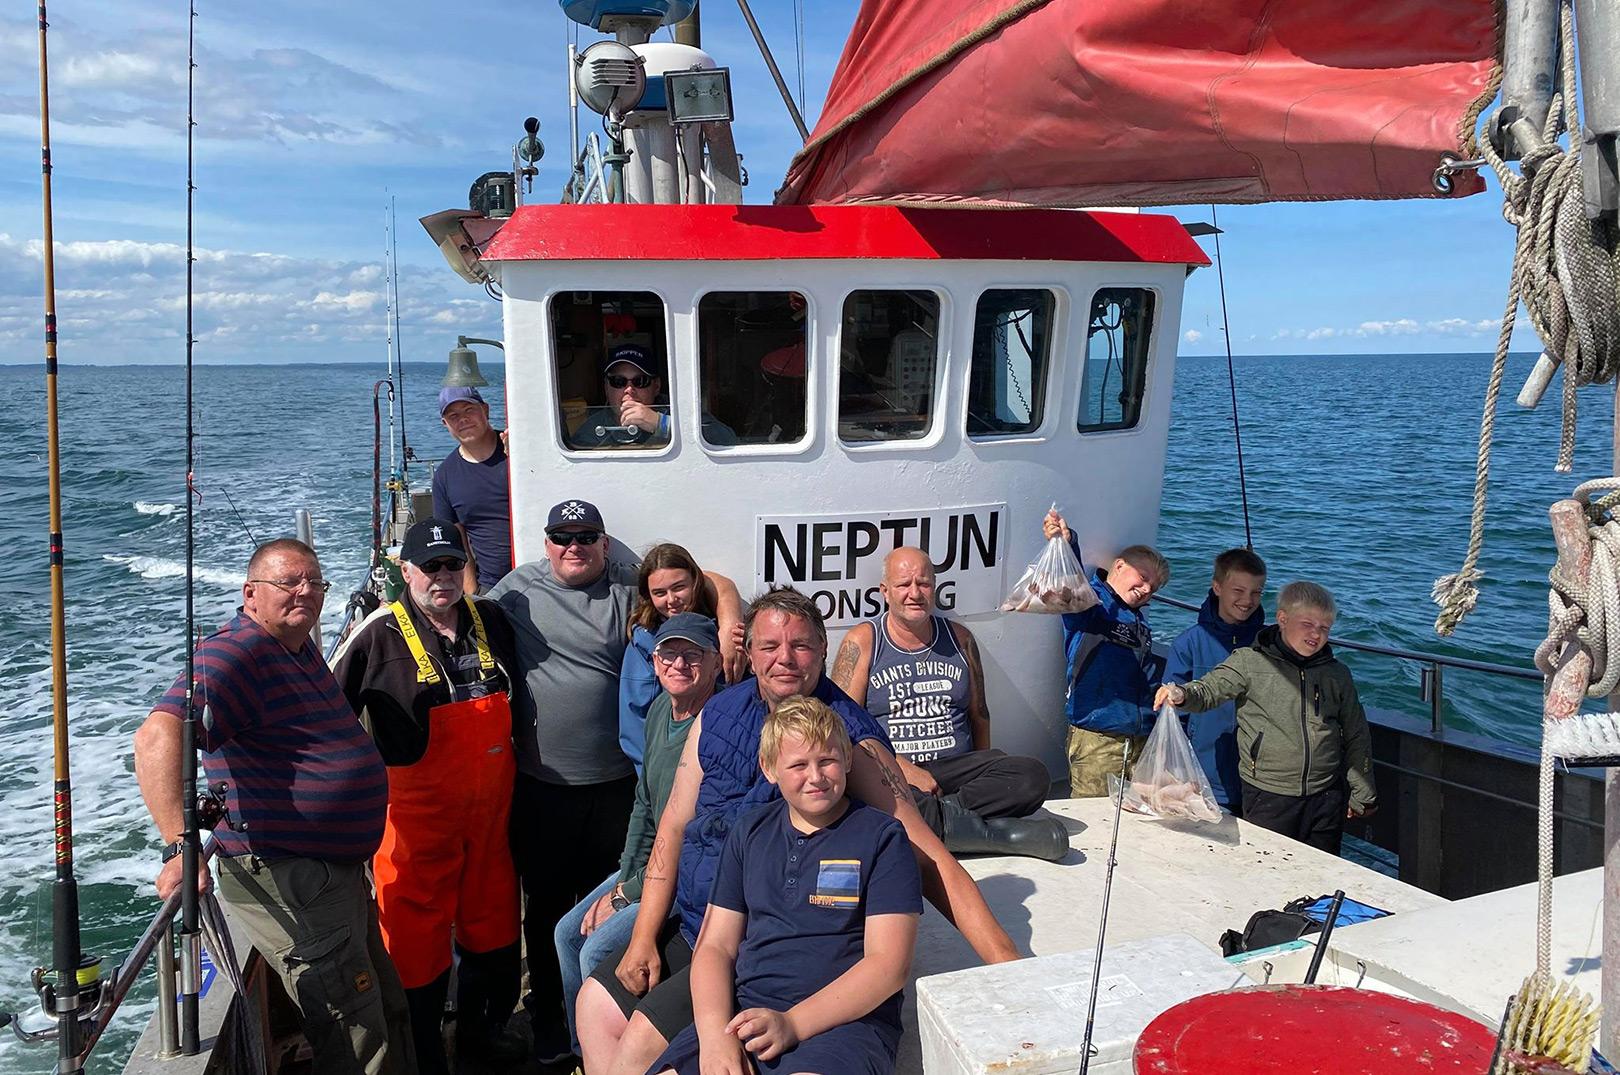 Happy Fishing på Neptun